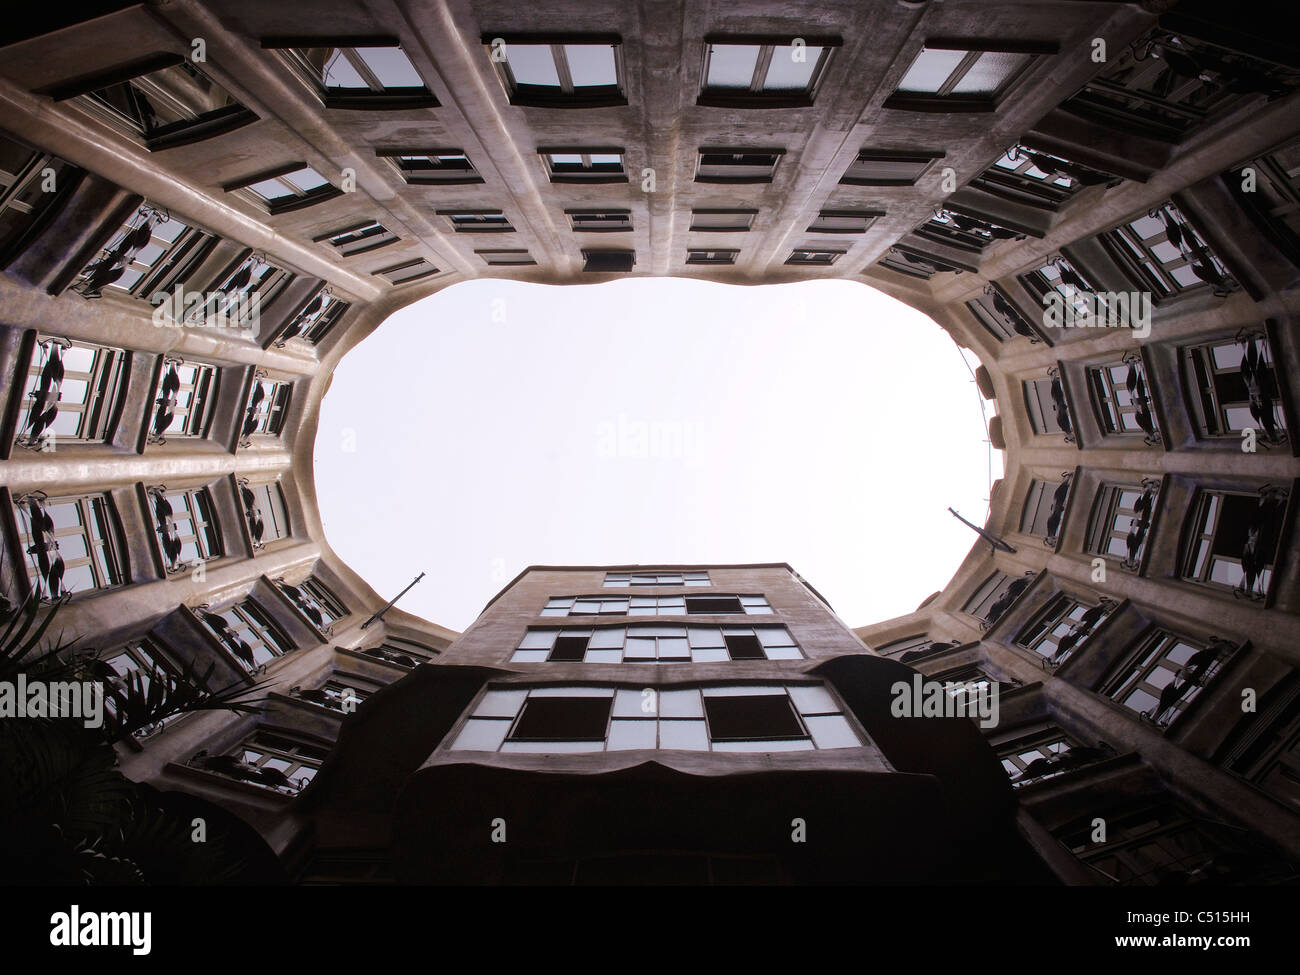 Spain, Barcelona, Casa Mila, atrium viewed from inner courtyard - Stock Image